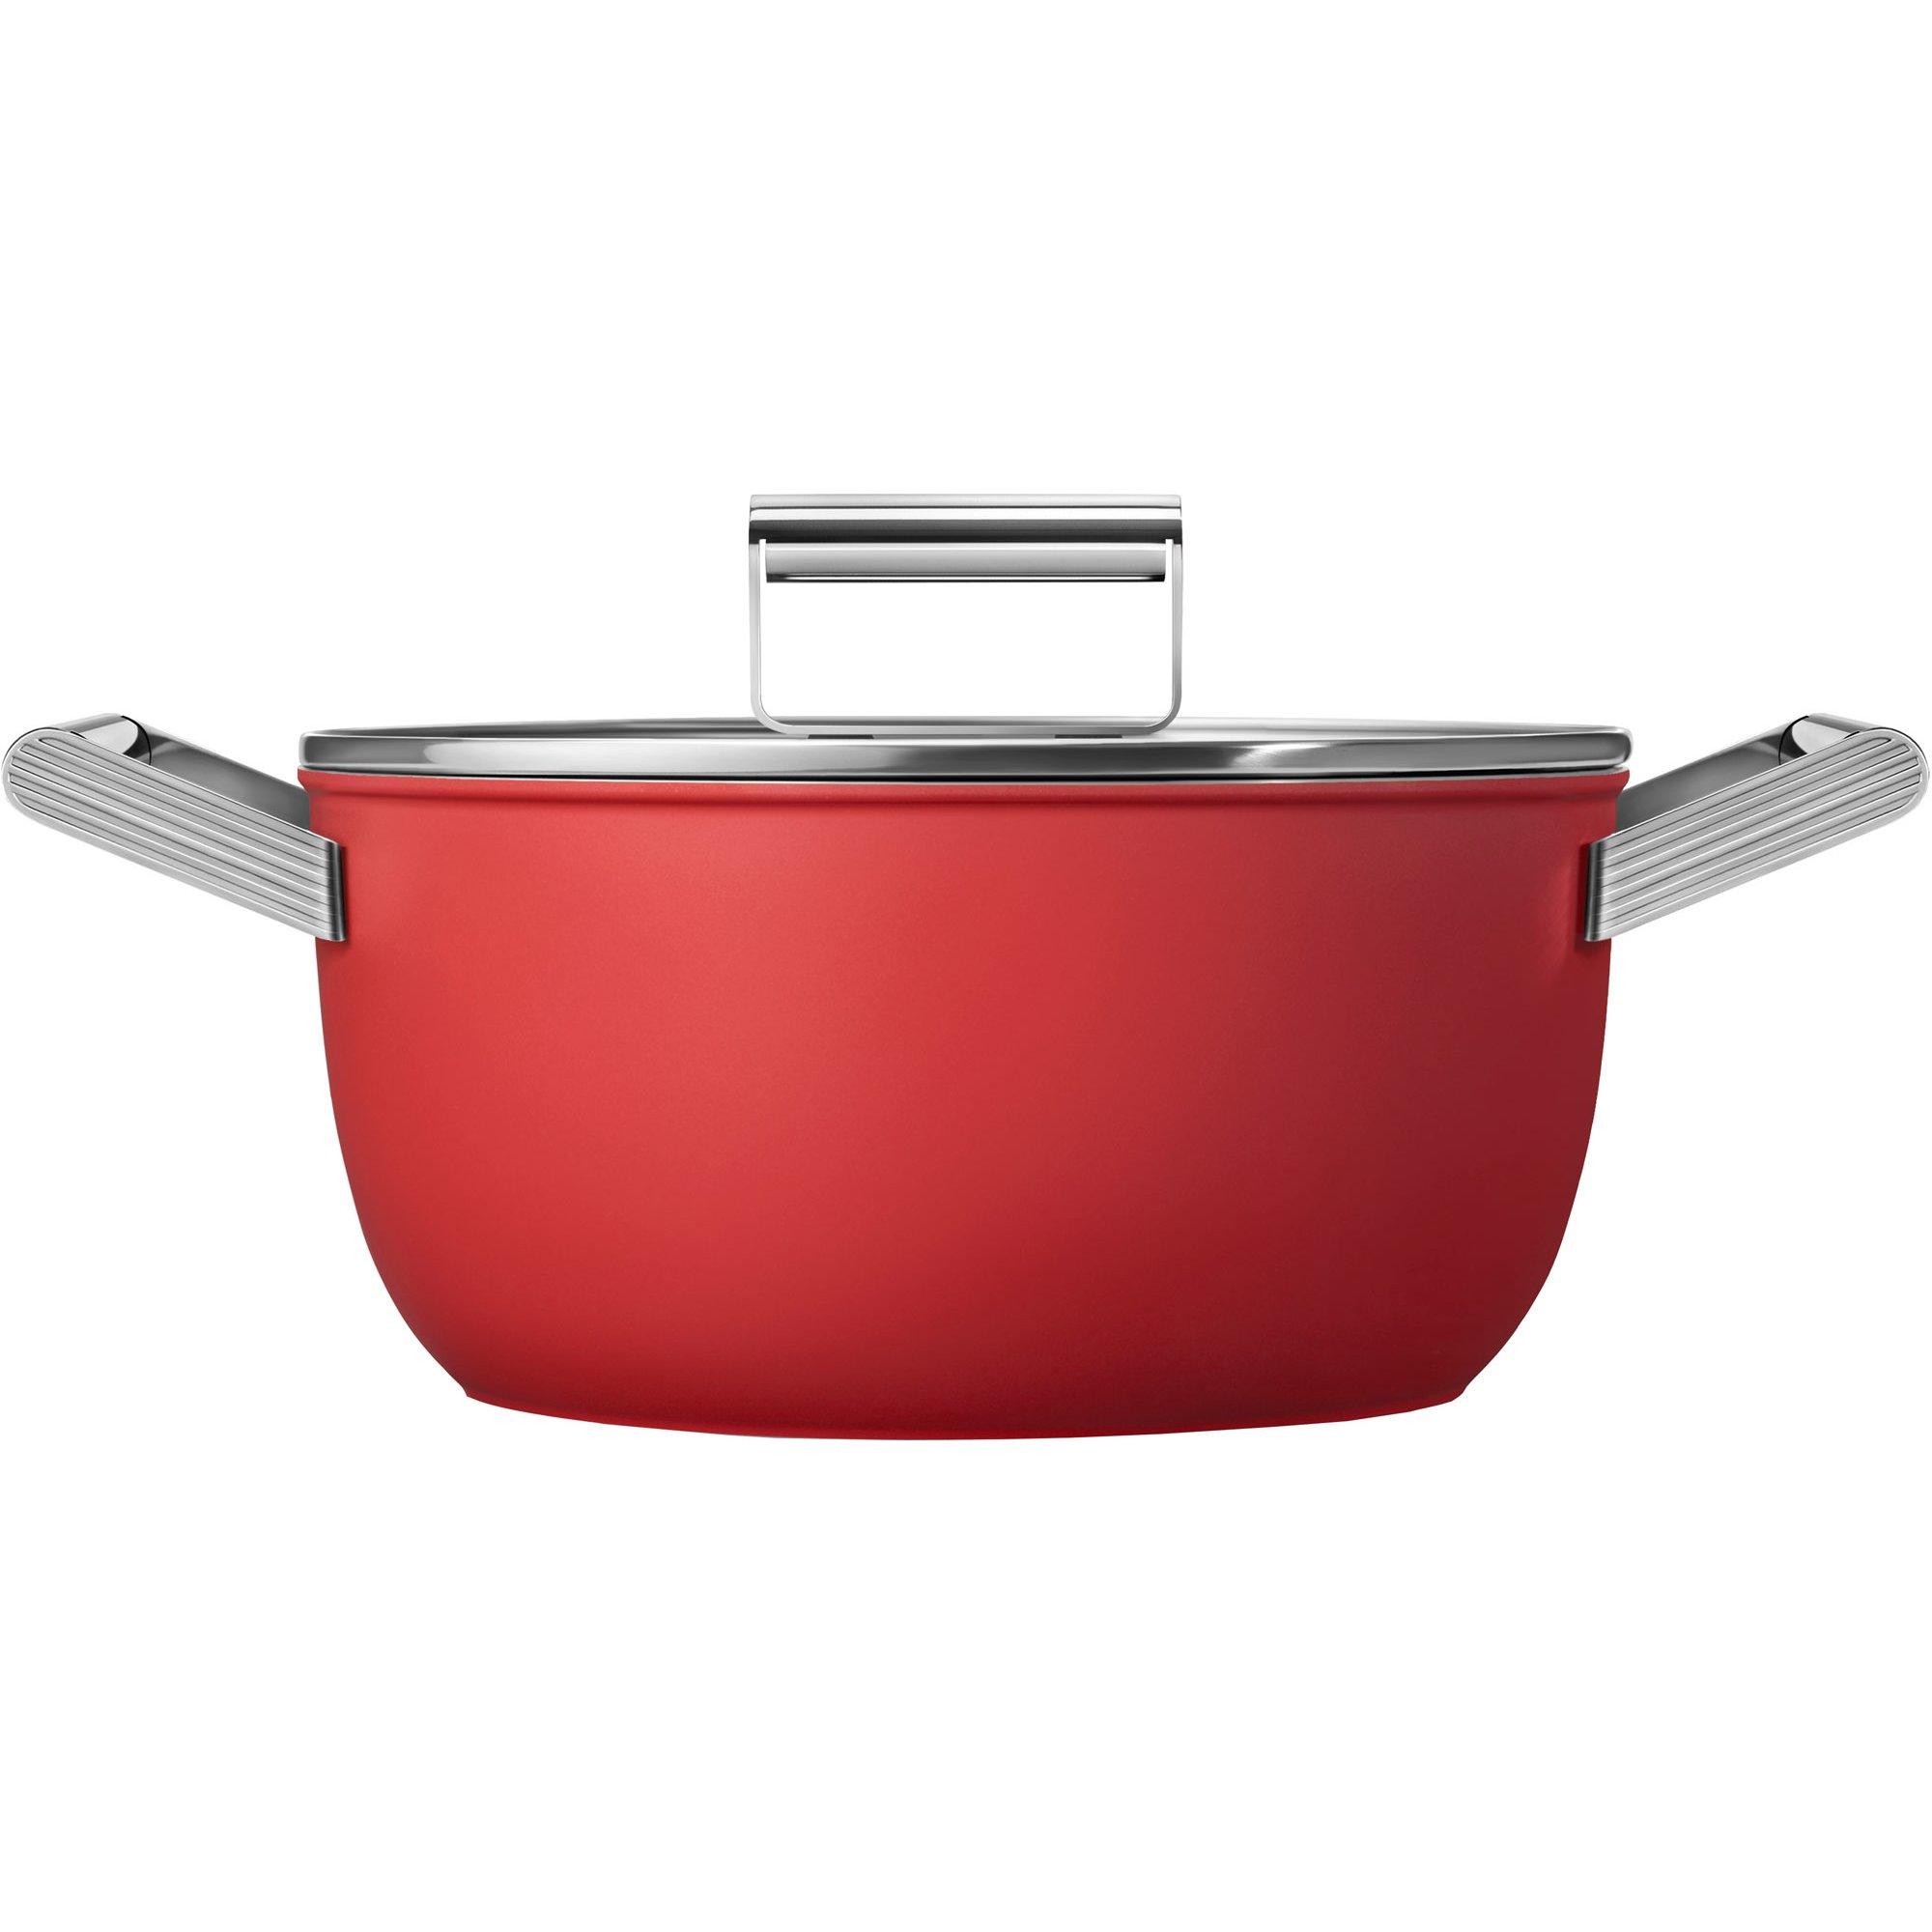 Smeg Kastrull m/lock 24 cm röd